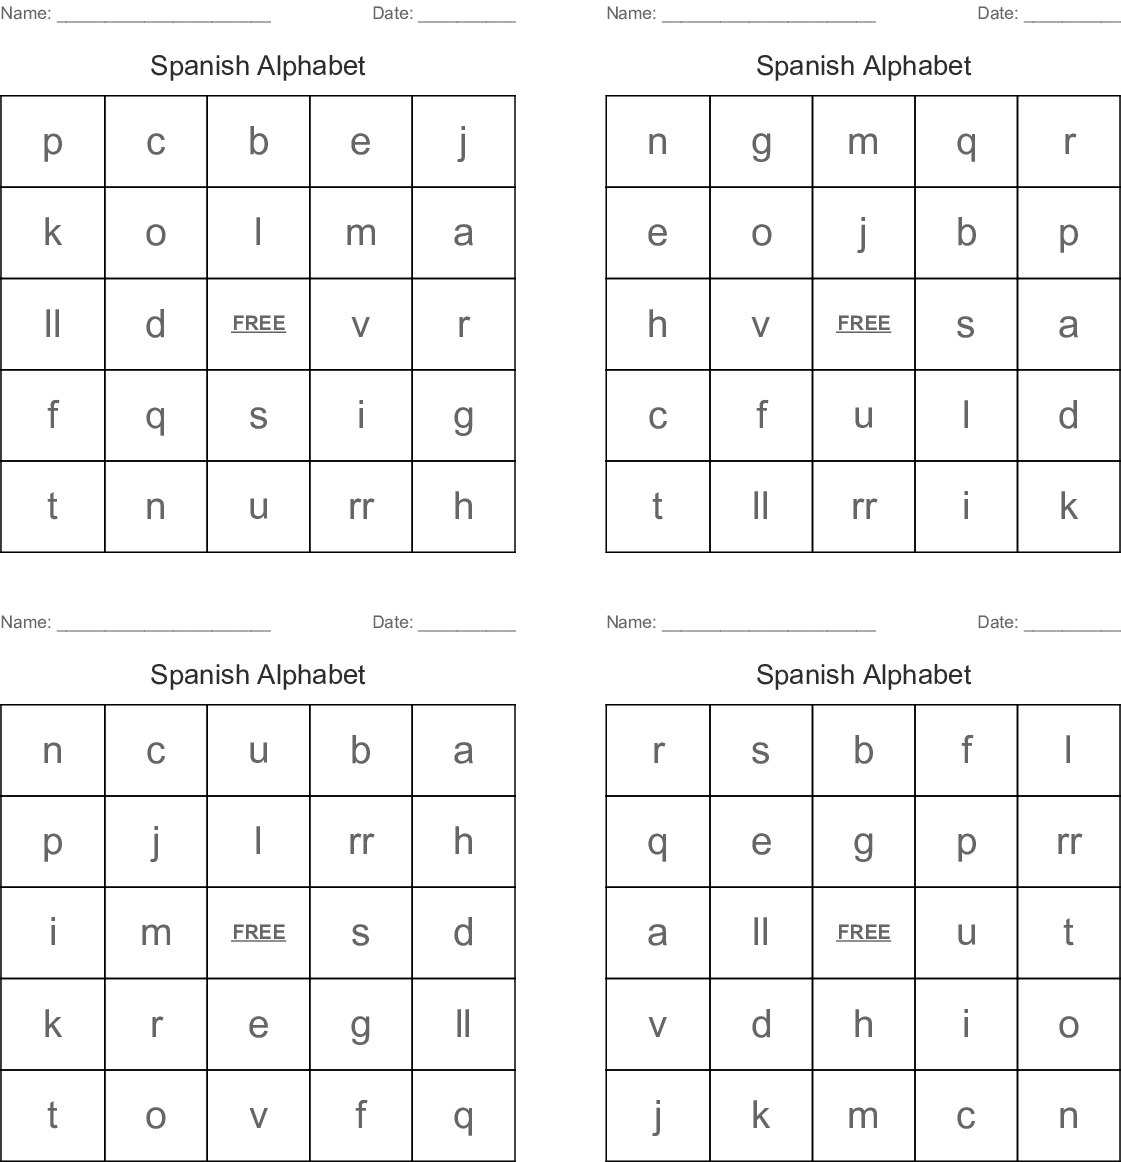 Spanish Alphabet Bingo Cards - Wordmint